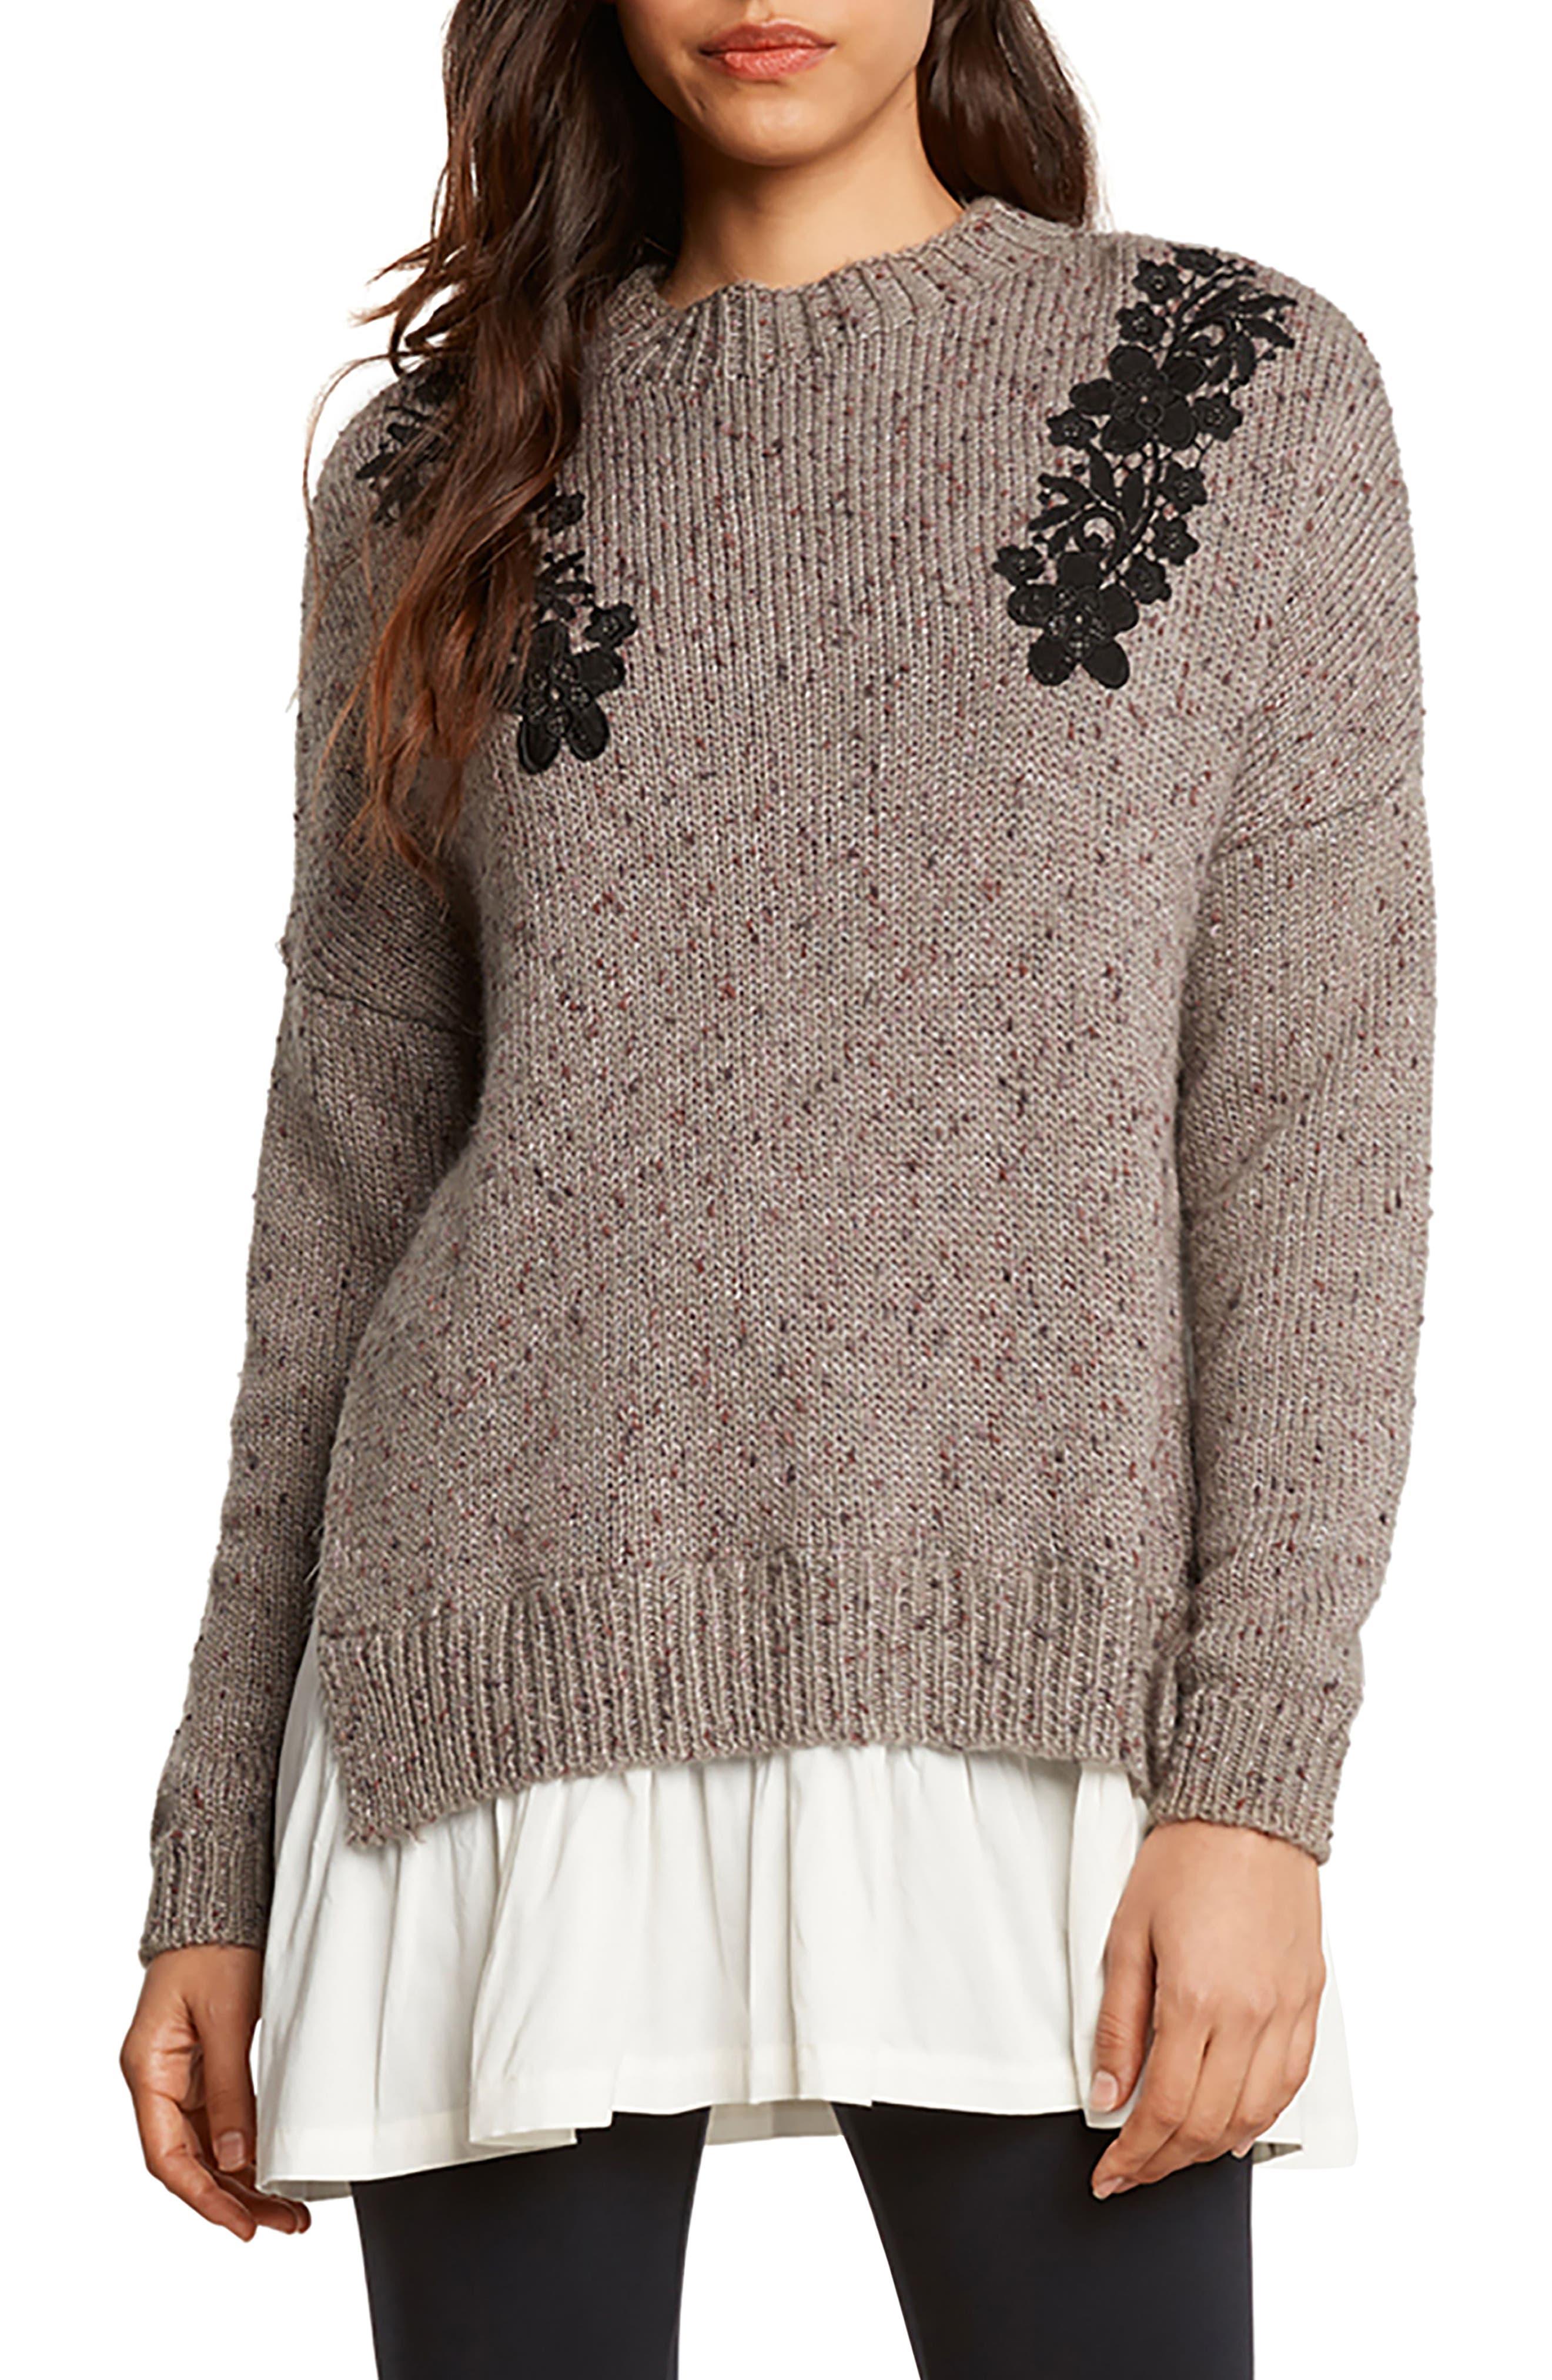 Main Image - Willow & Clay Appliqué Poplin Trim Sweater